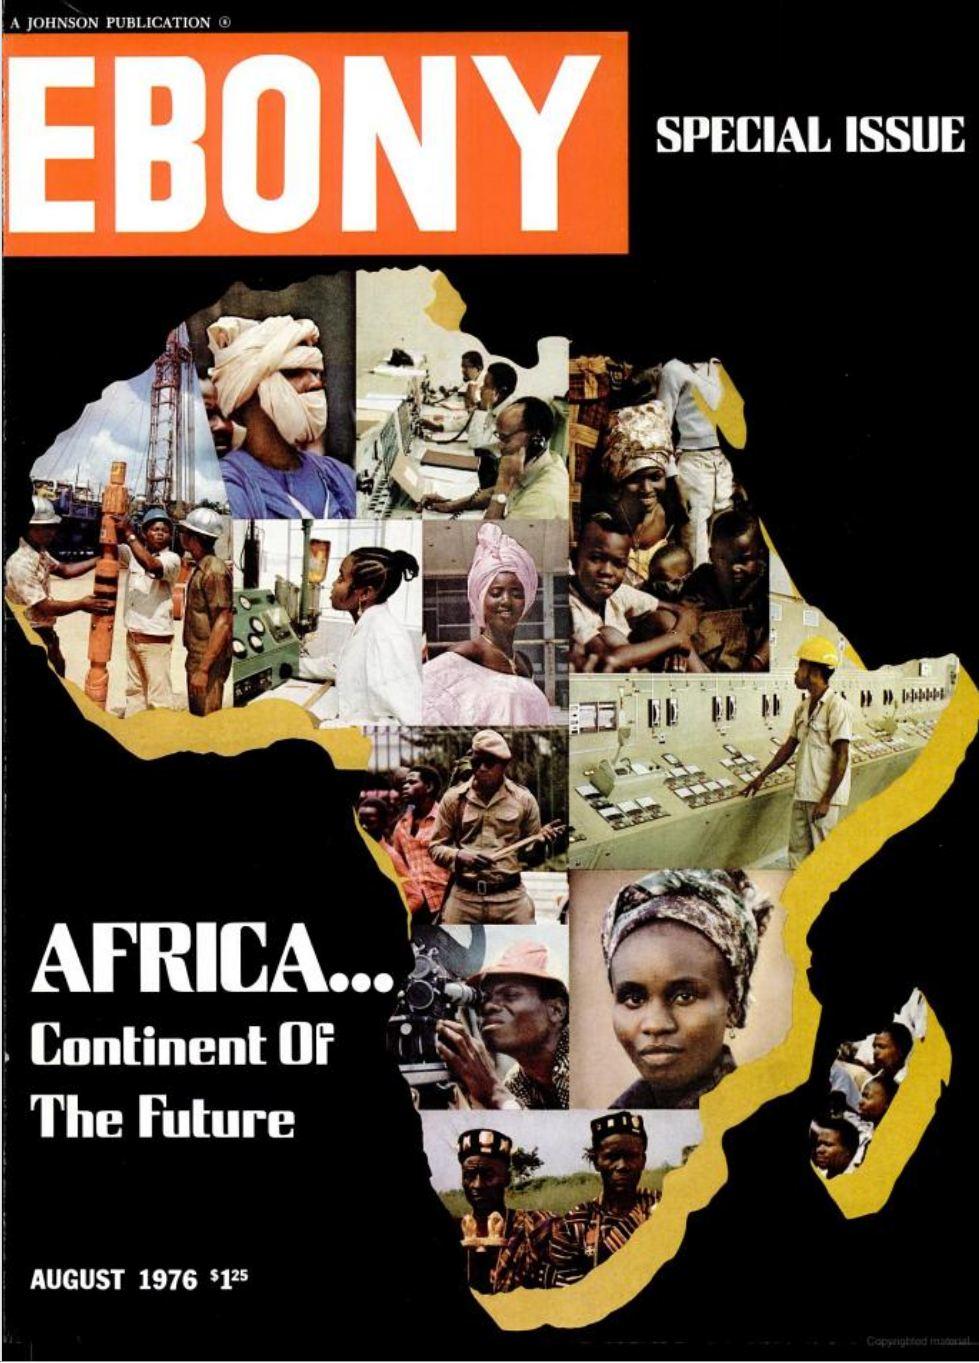 Alex Haley - Ebony Magazine - 1976